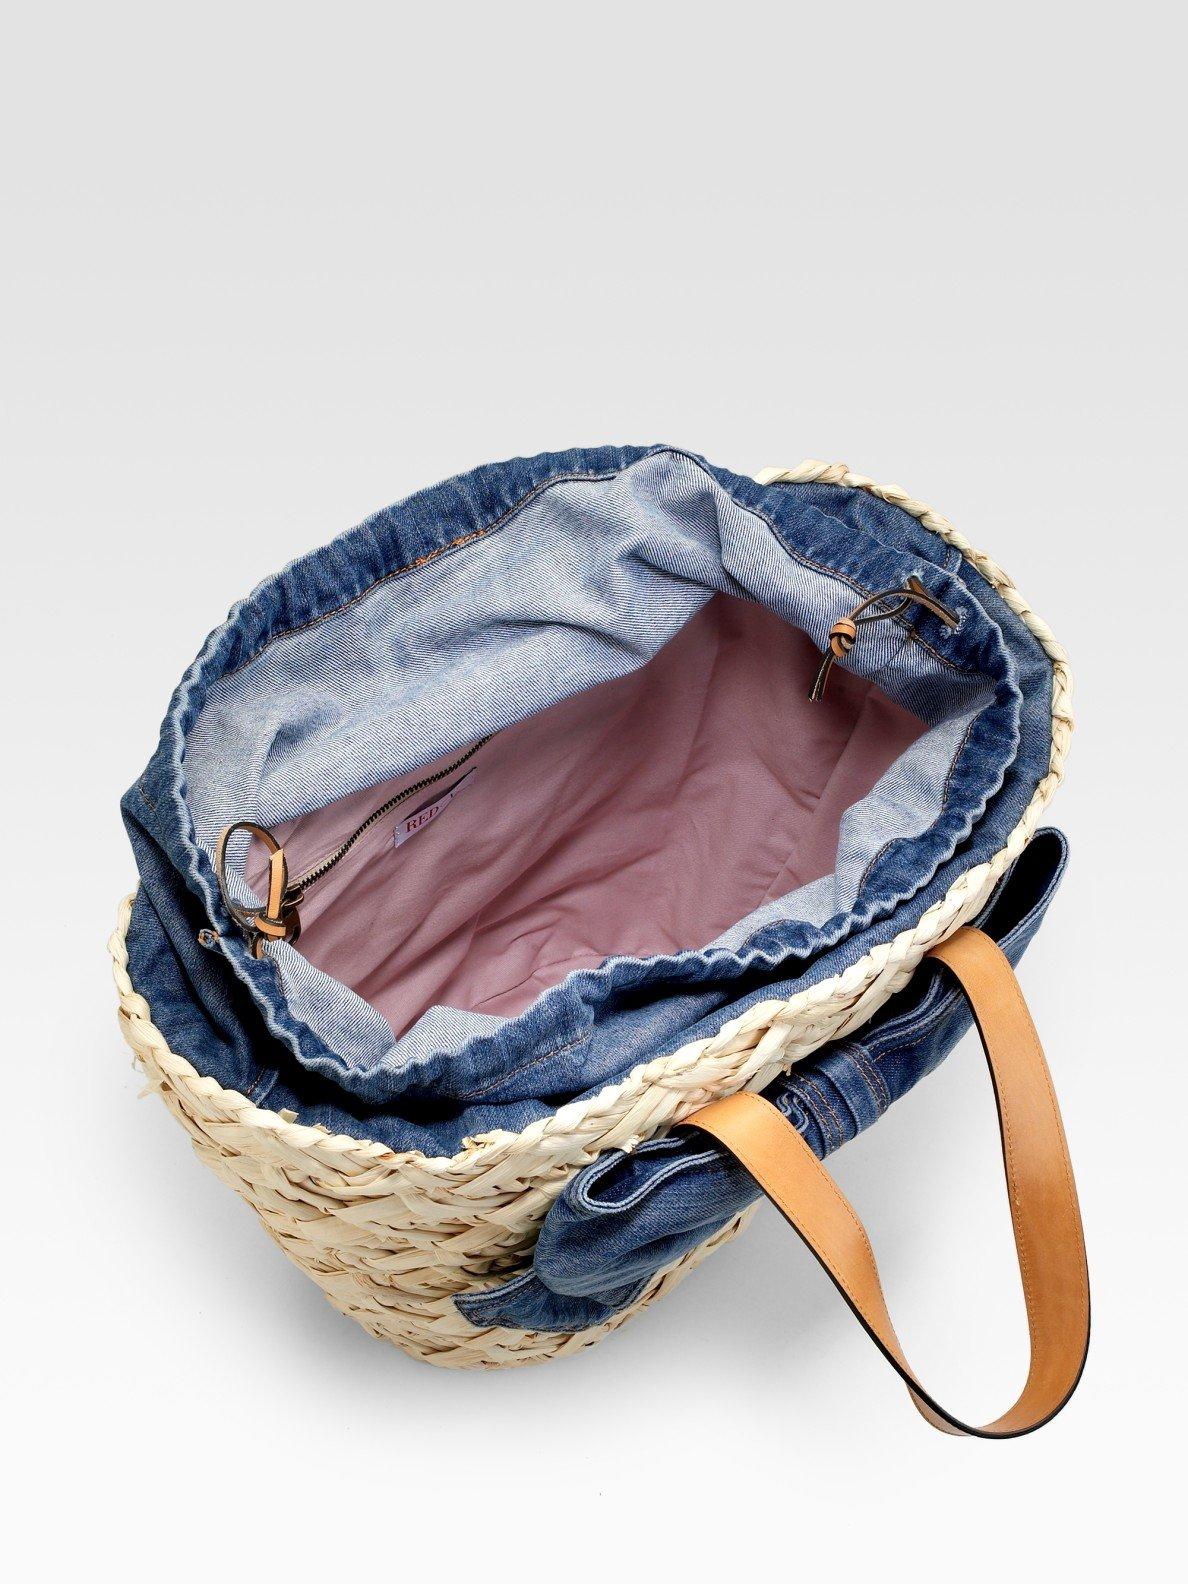 eedbc381f30 RED Valentino Straw & Denim Bucket Bag in Natural - Lyst